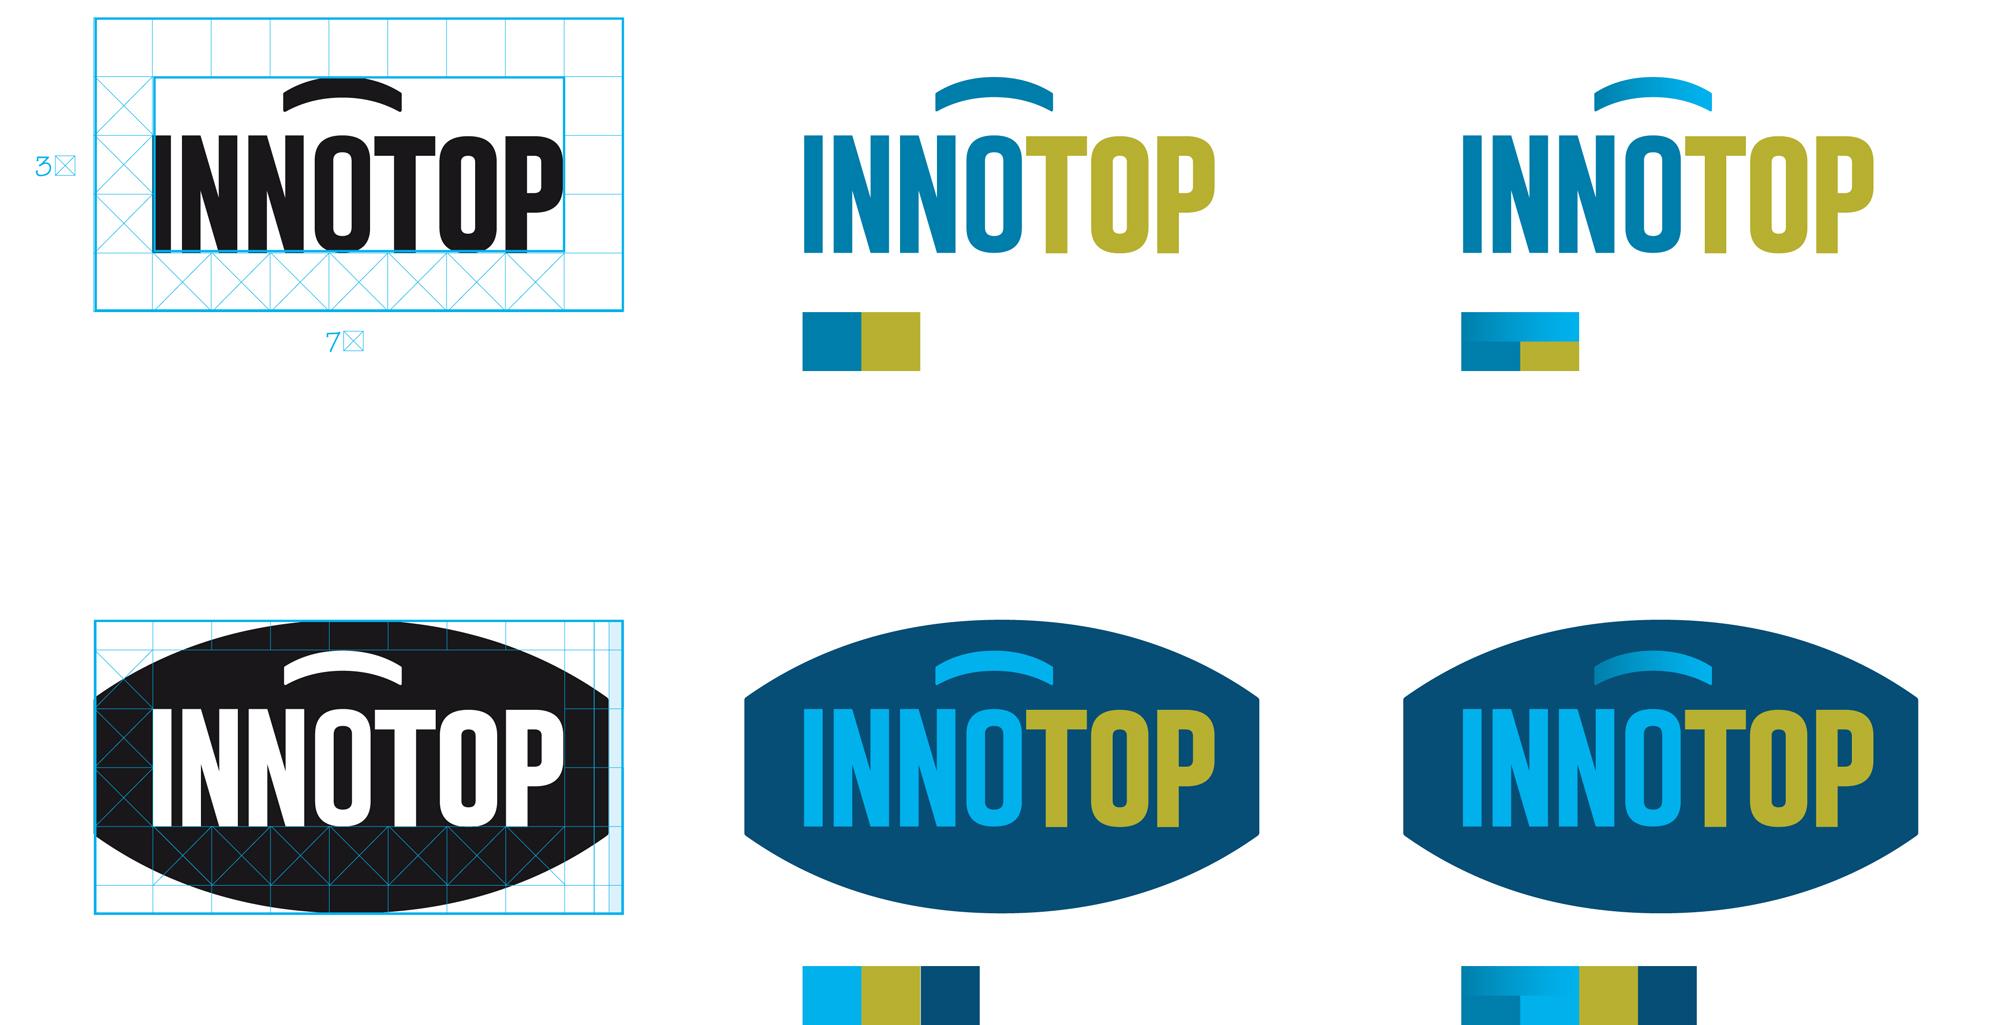 innoPRO_TOP_branding_F2_print.indd